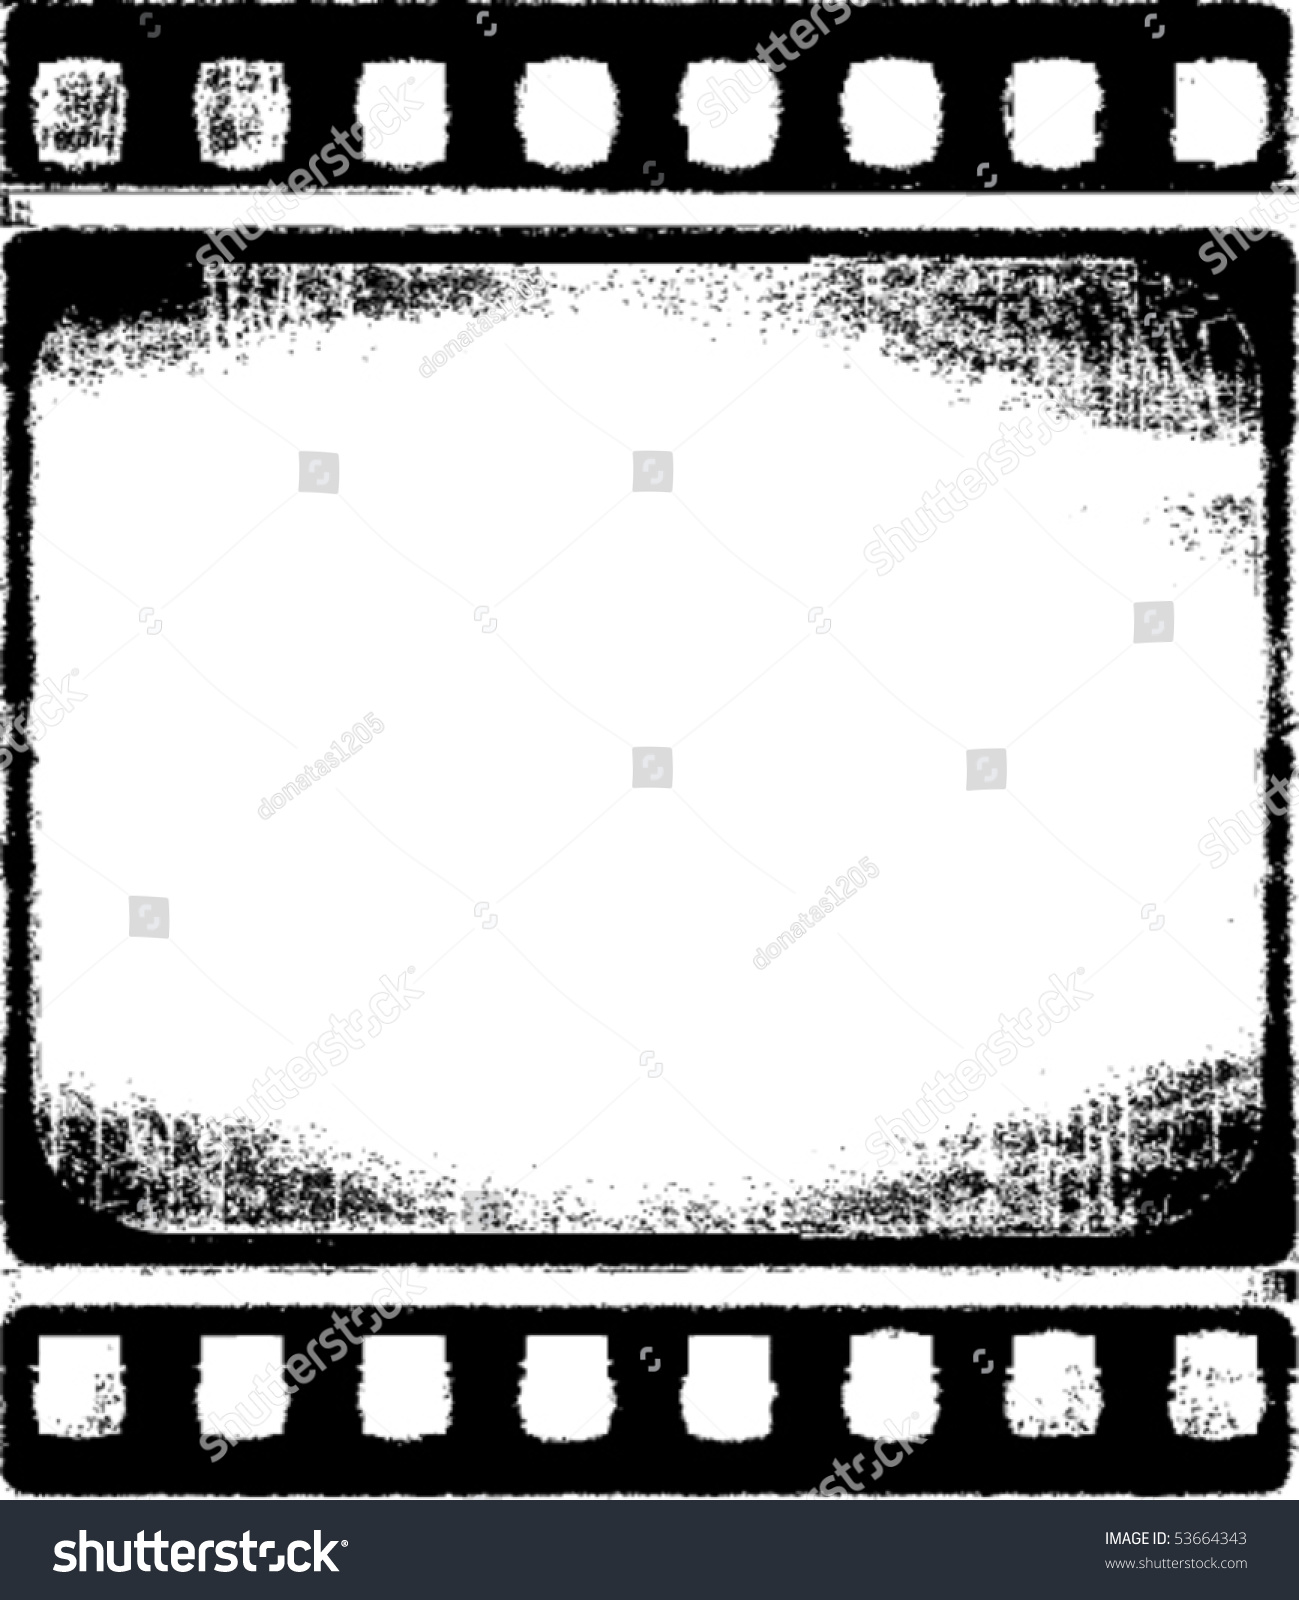 Vector Grunge Filmstrip Frame Stock Vector HD (Royalty Free ...